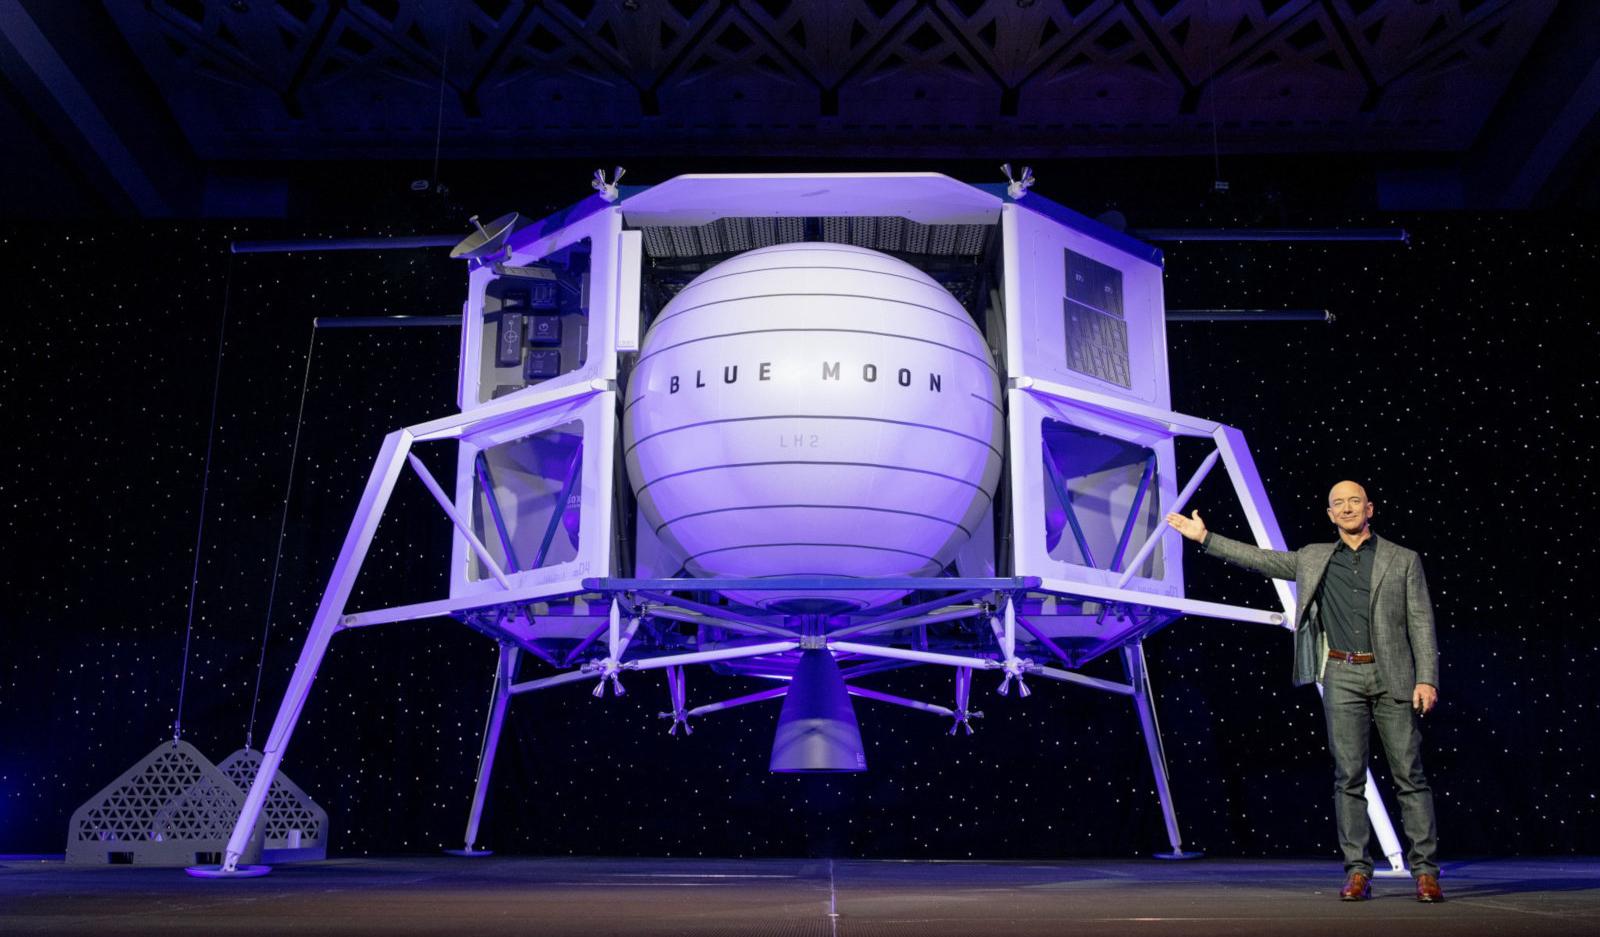 Глава Amazon Джефф Безос намерен покорять Луну